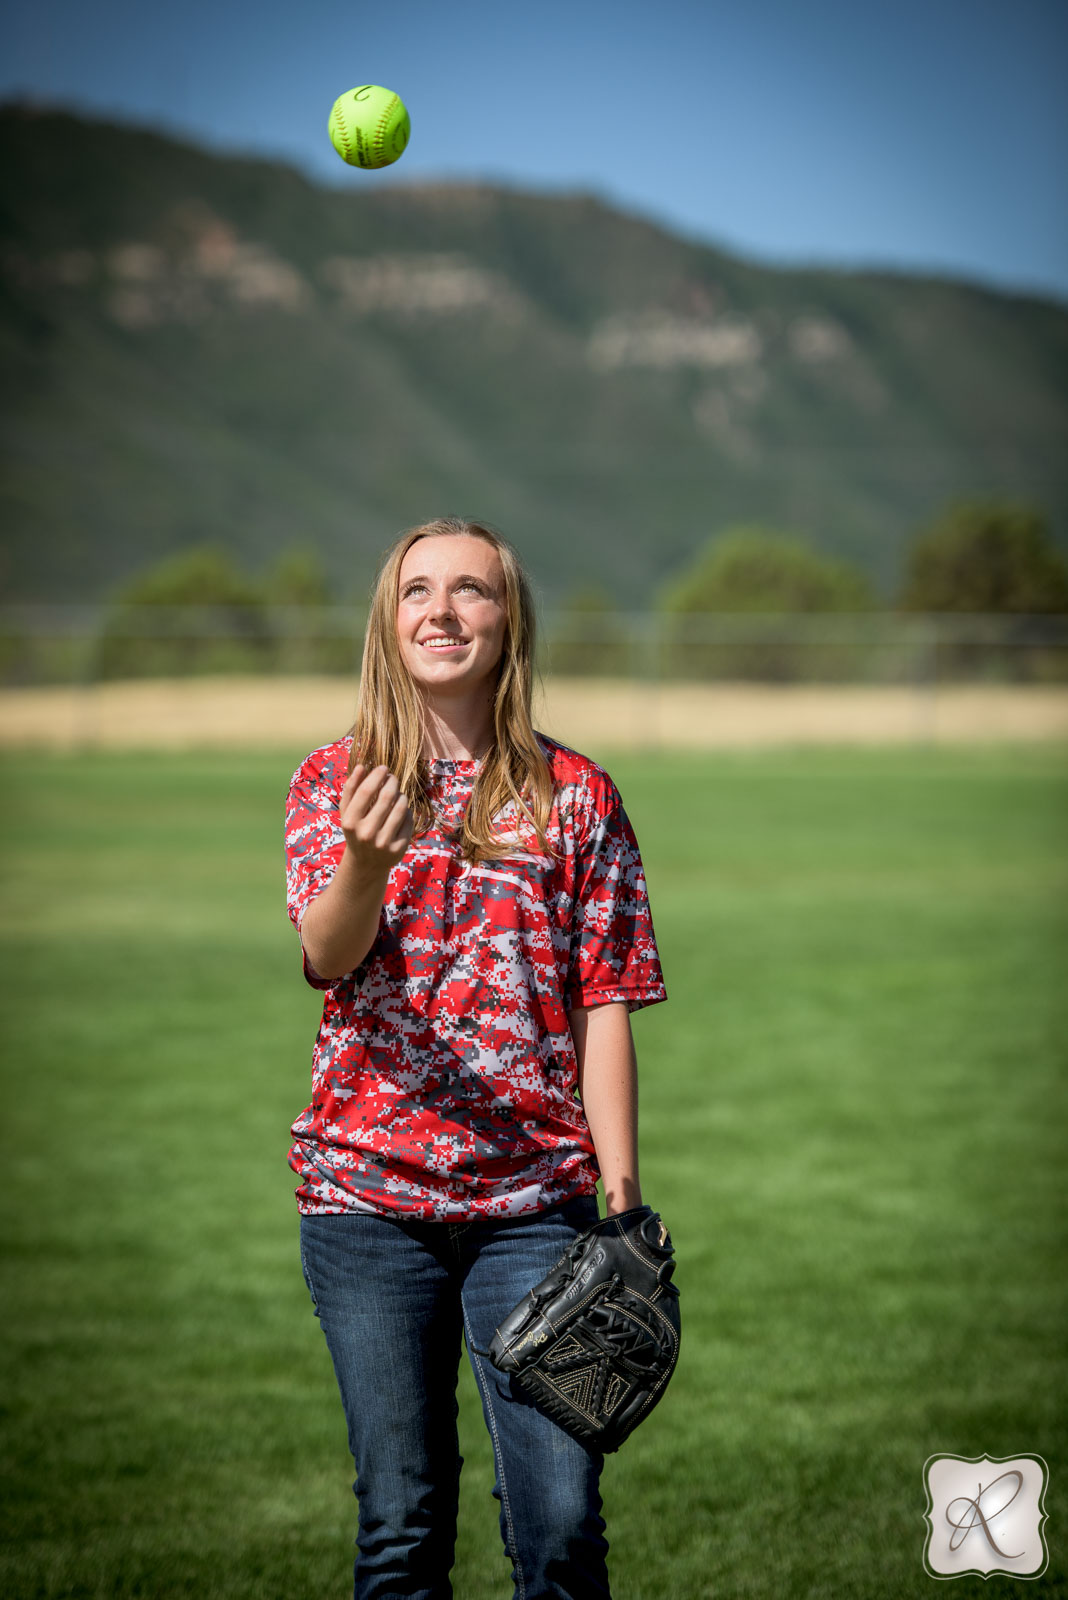 Katrina Chandler's senior pictures Durango Colorado - sports